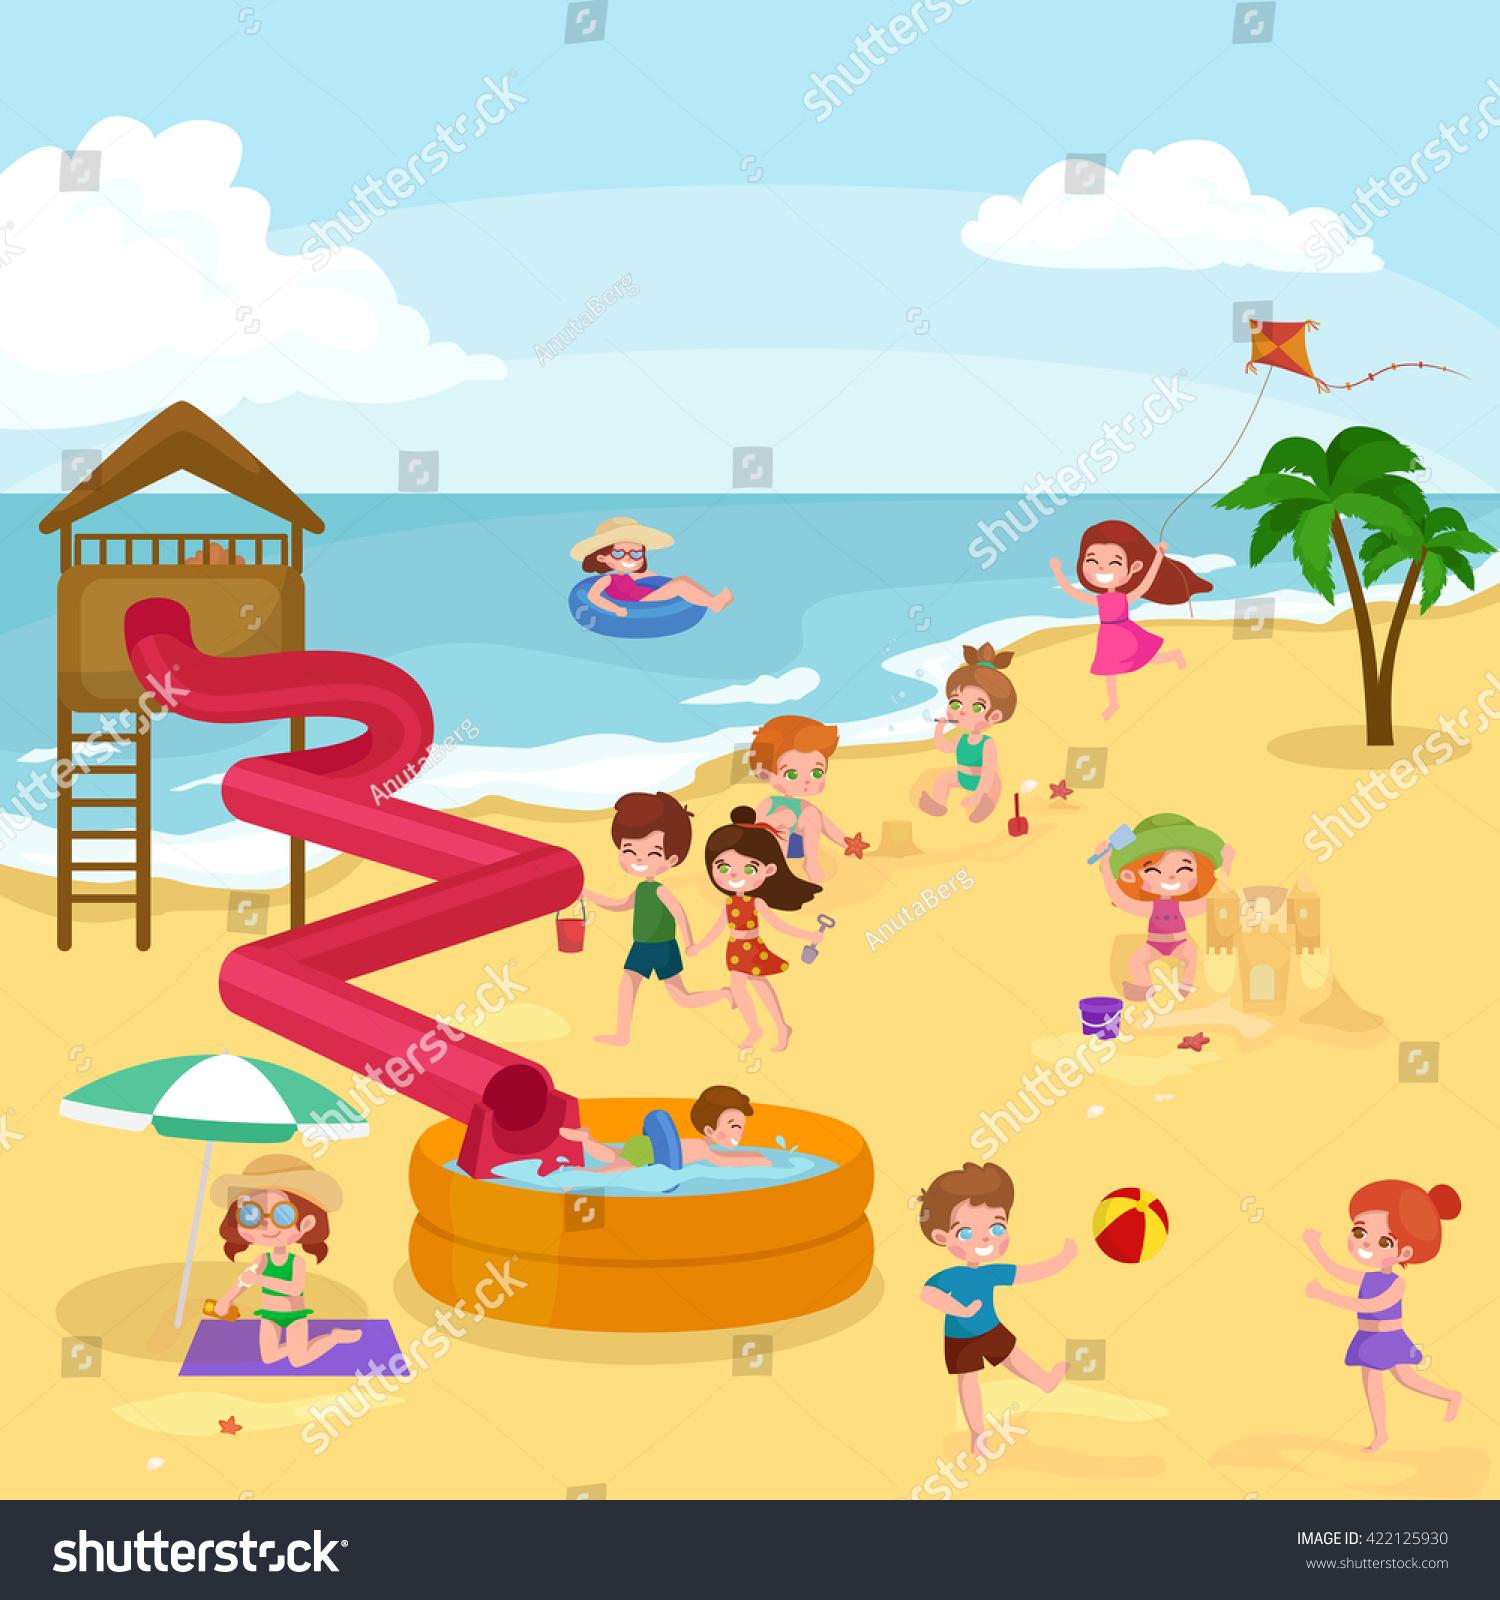 Children Summertime Vacation Parkkids Playing Sand Stock